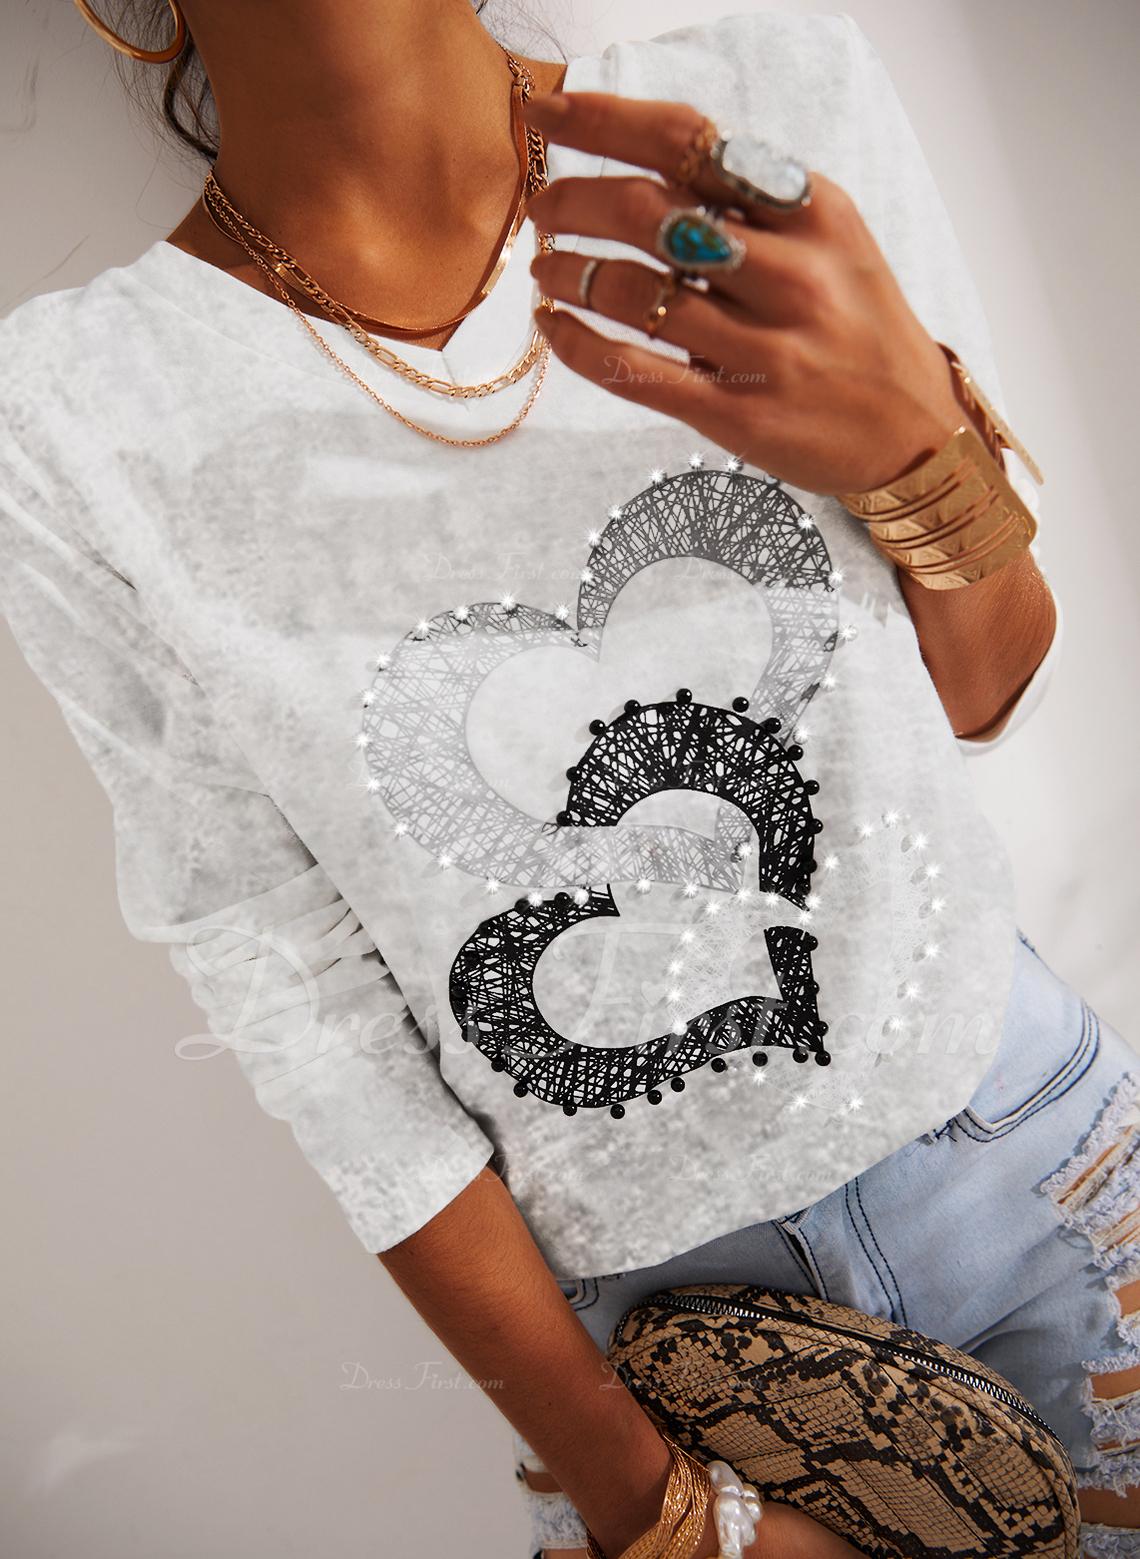 Druck Herz V-Ausschnitt Lange Ärmel Lässige Kleidung T-shirt